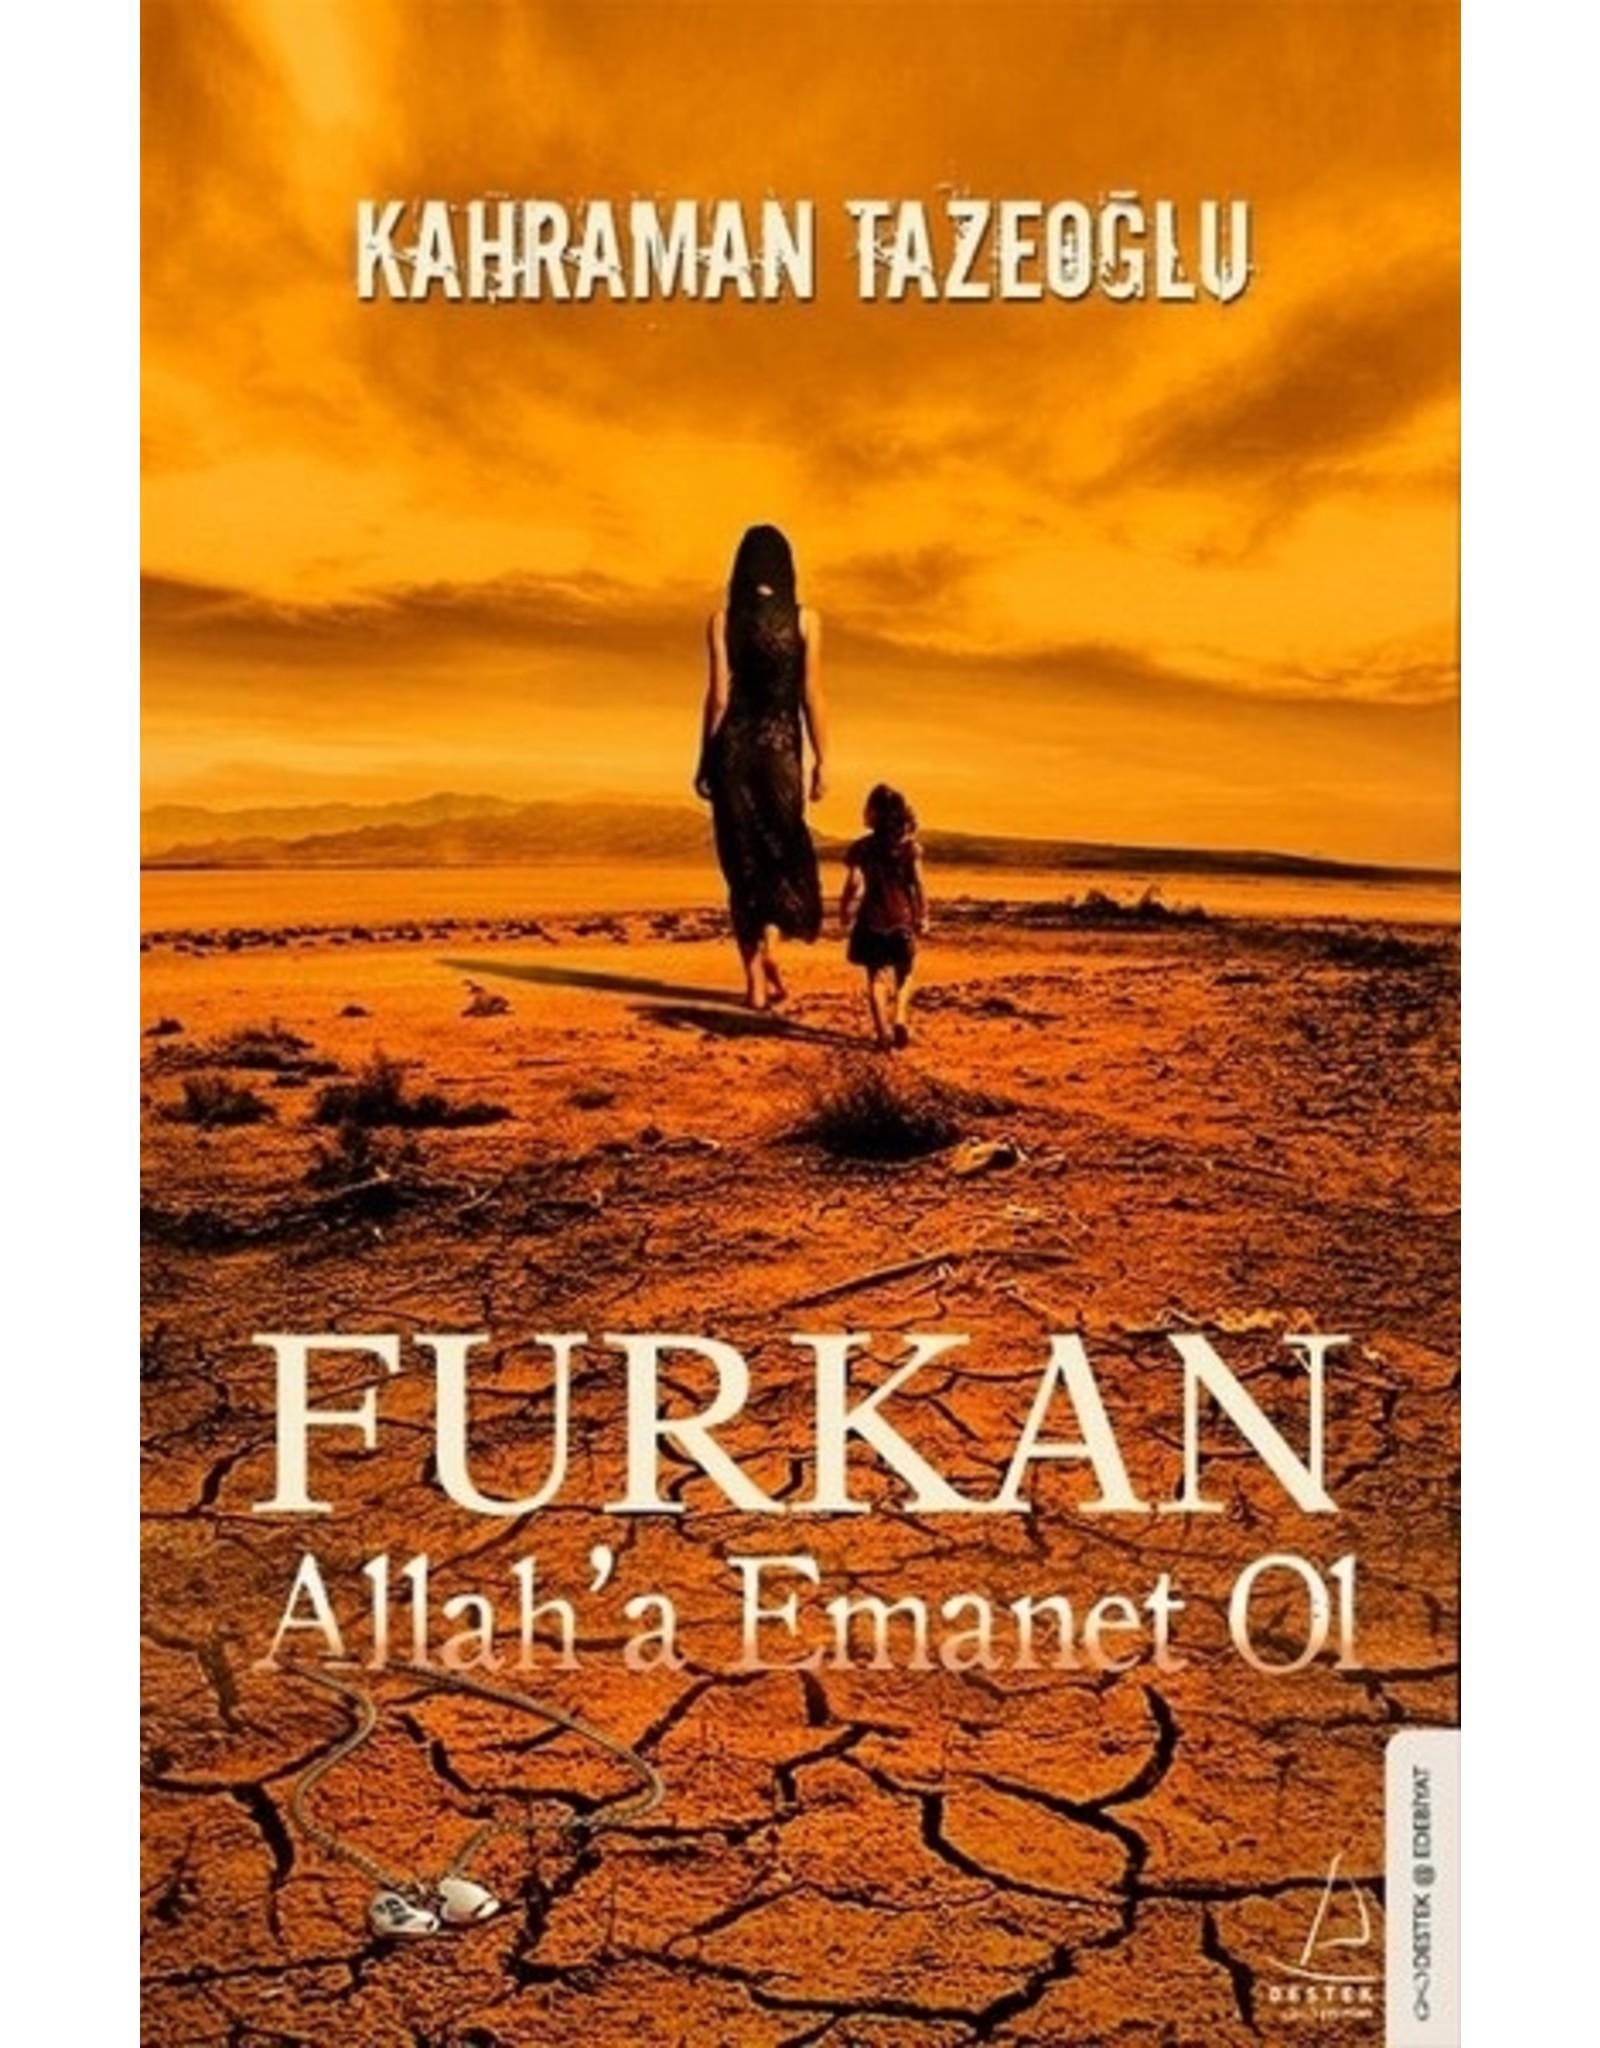 Kahraman Tazeoğlu Furkan Allah'a Emanet Ol